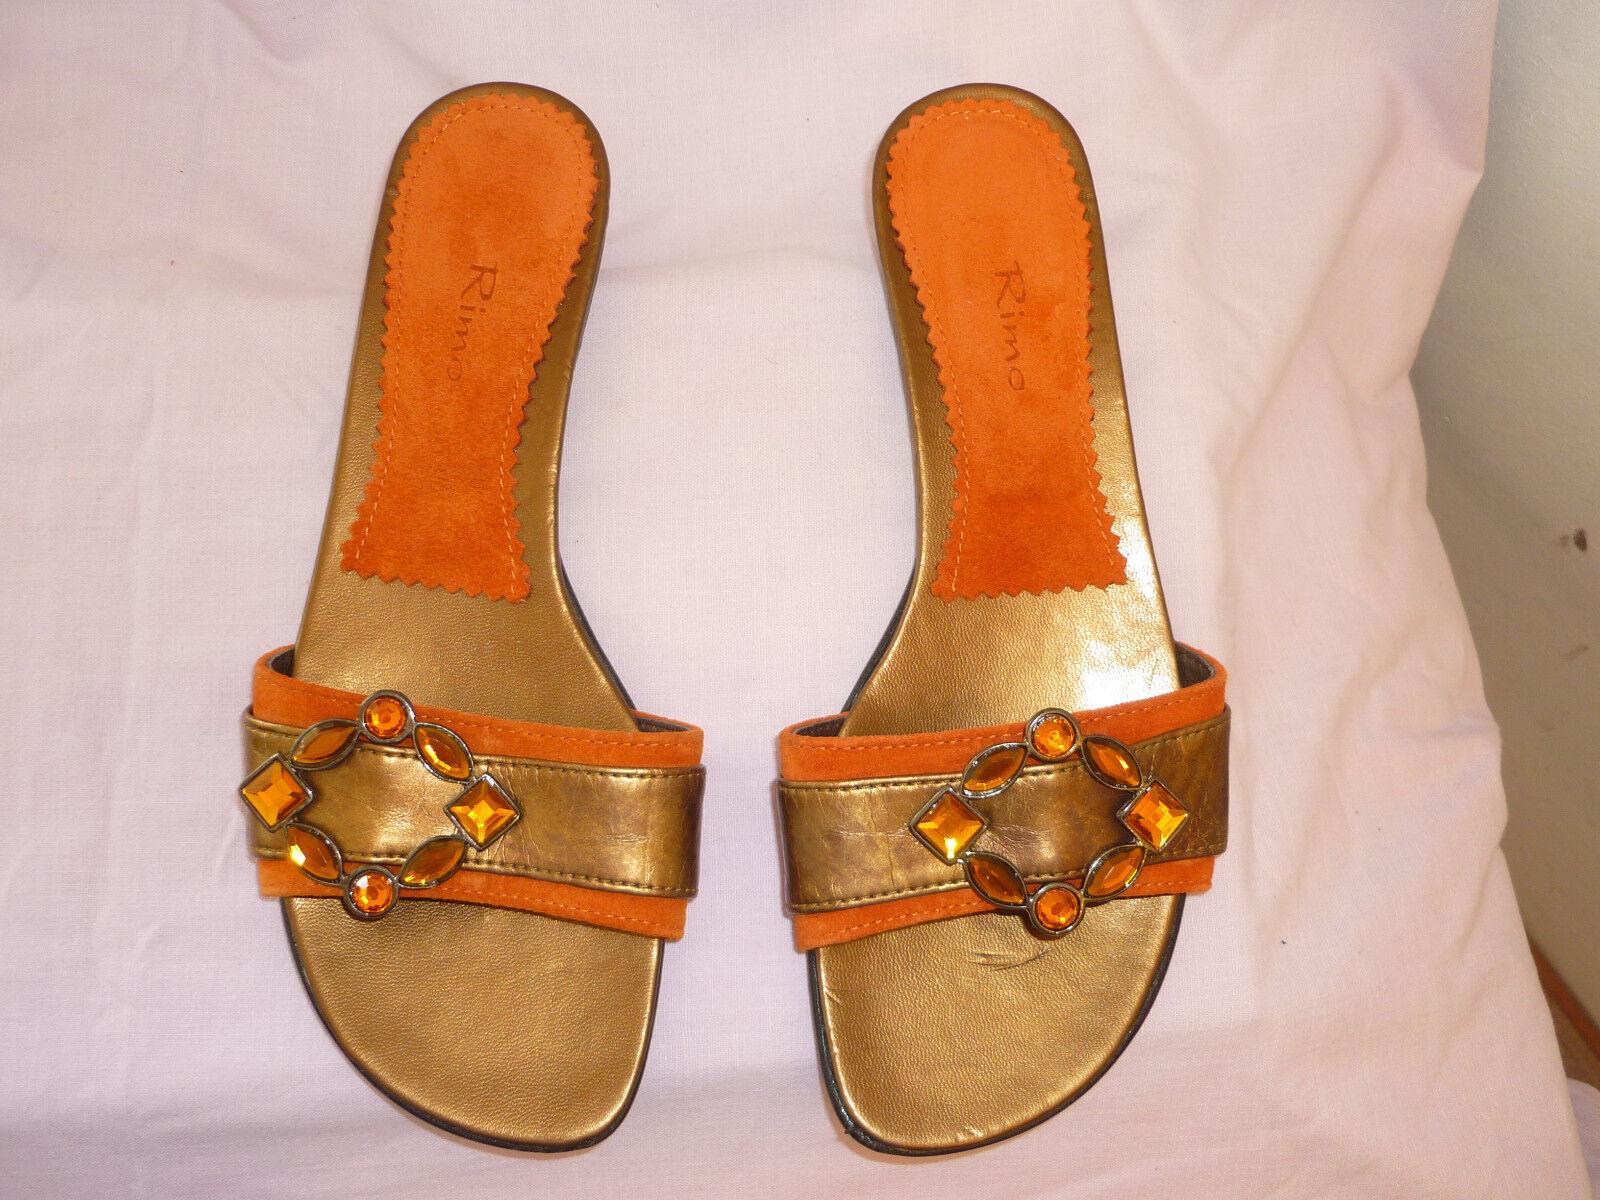 NEU  Rimo-glamouriose Orange Pantolette Leder-Futter m.Strass-Brosche Gr.37 Abs.